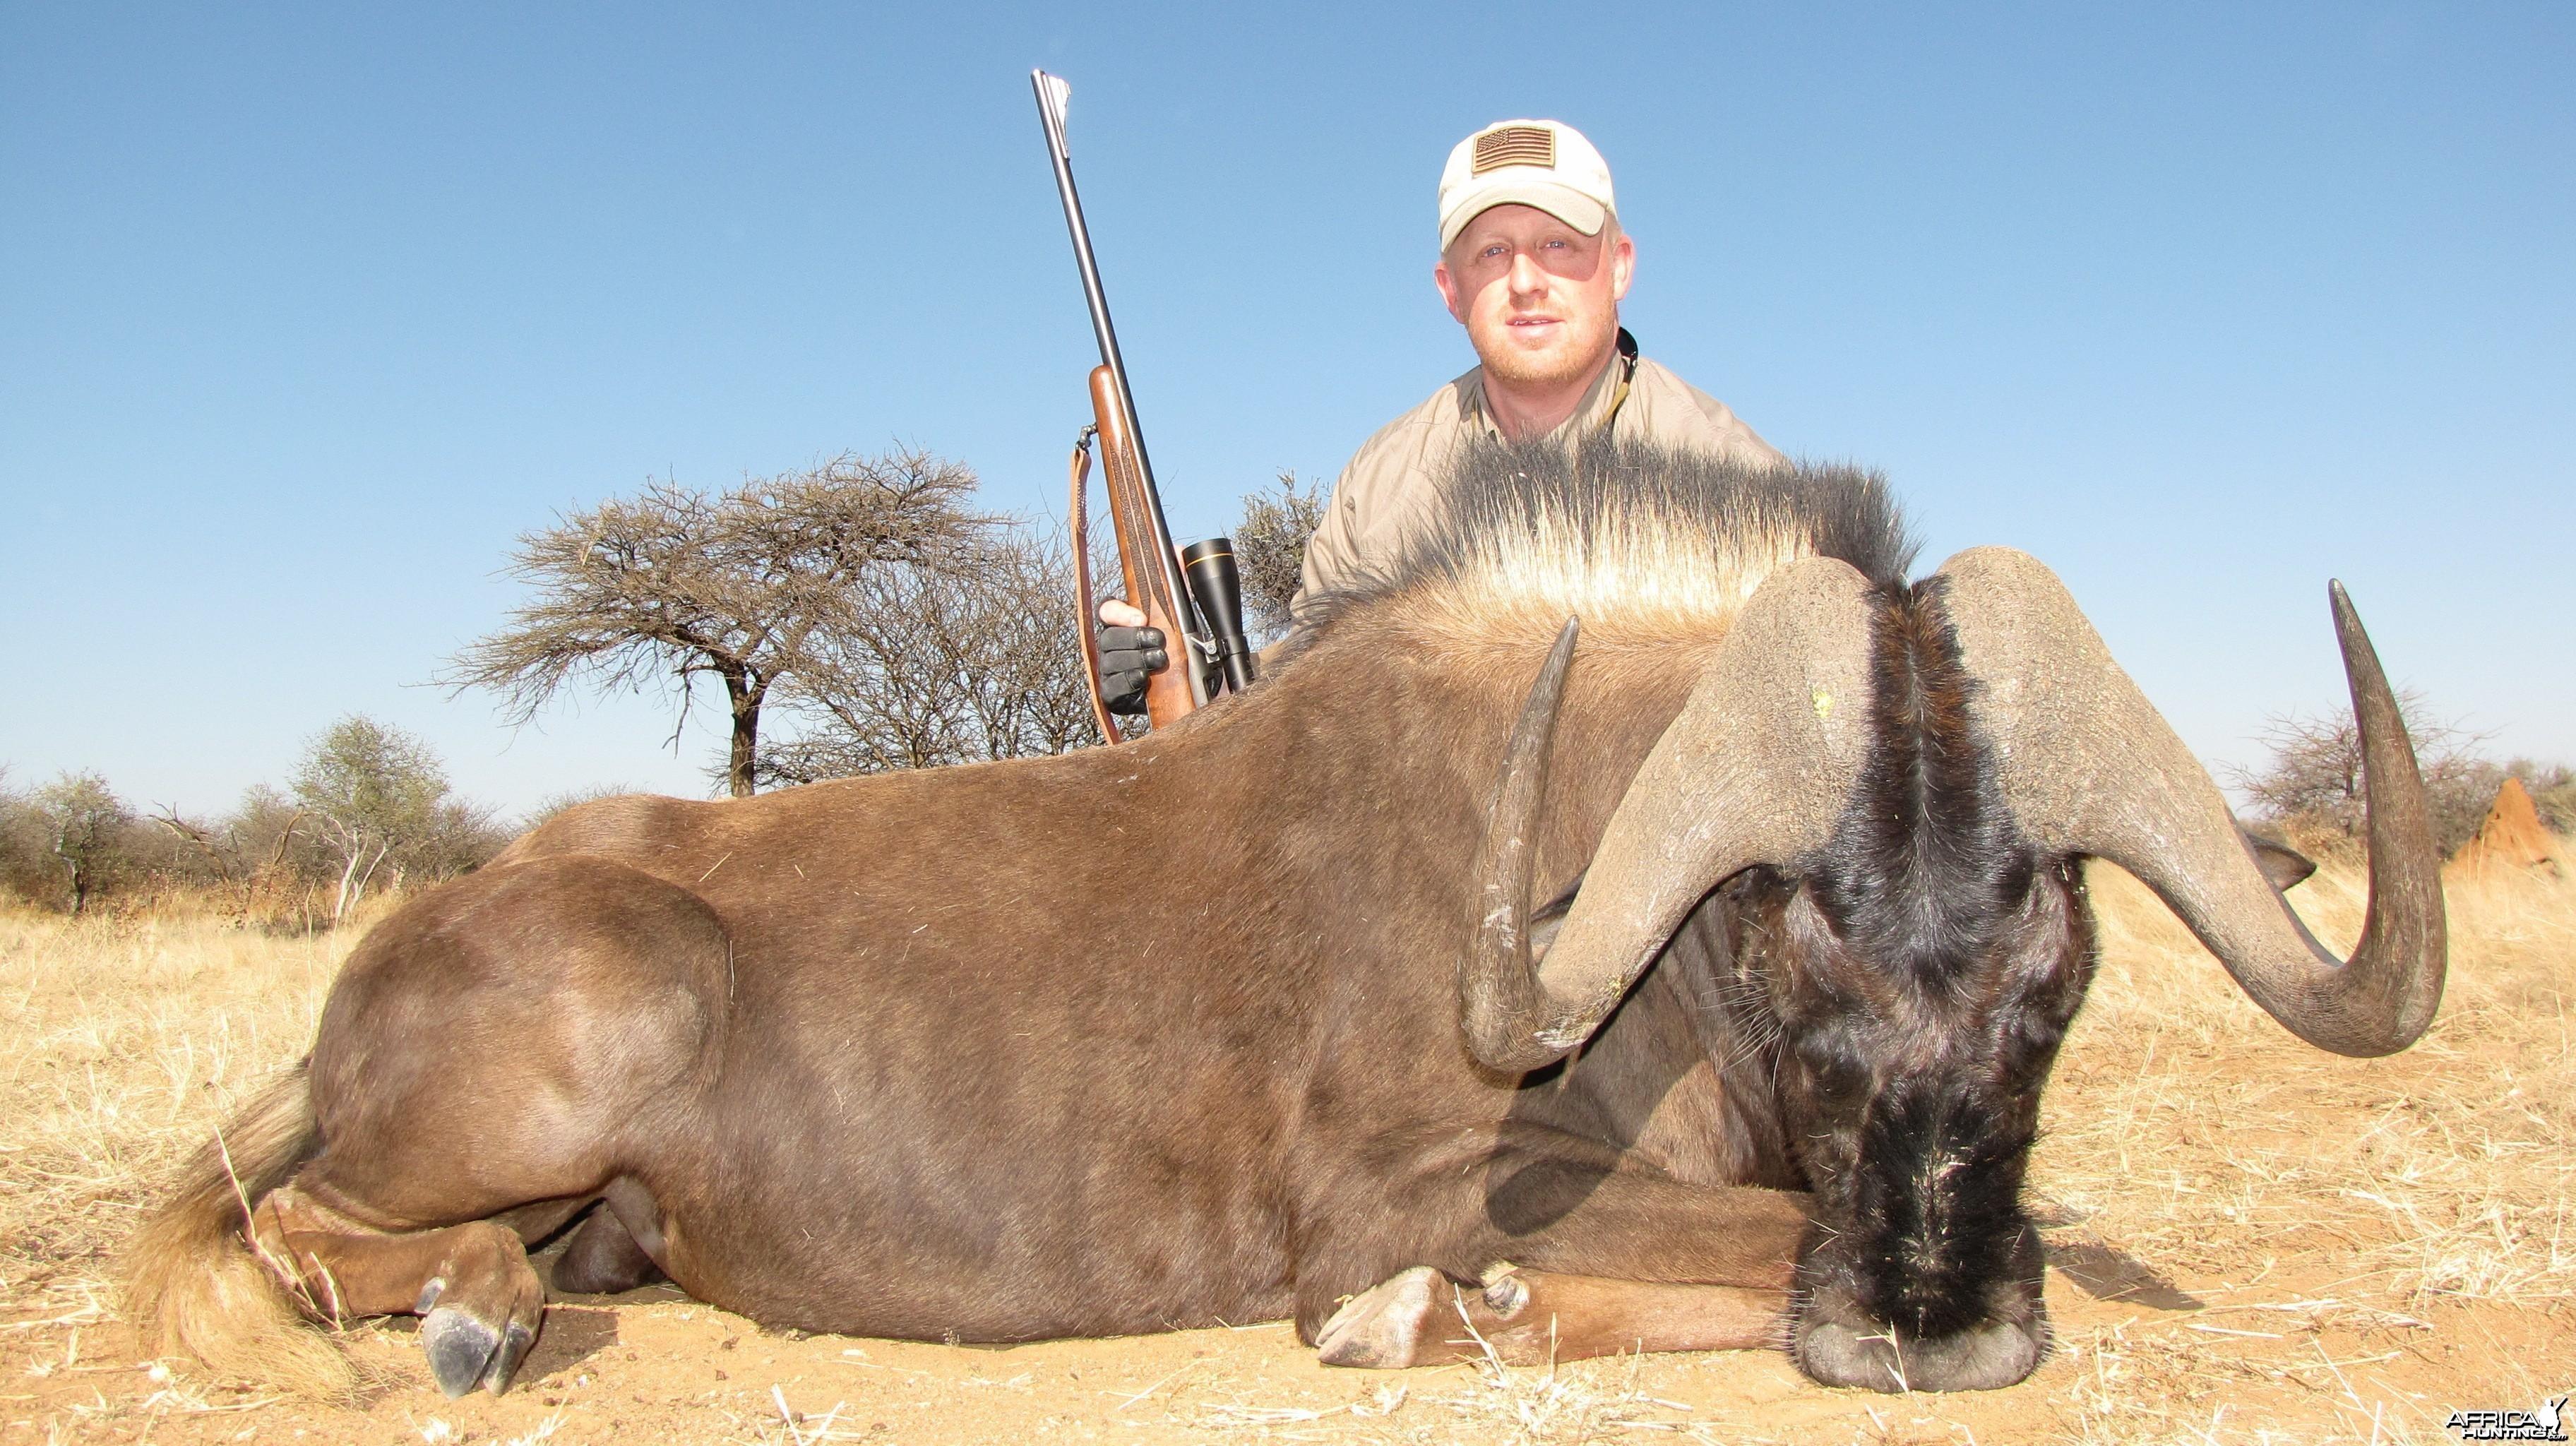 Black Wildebeest Namibia 2011 235.5 cm